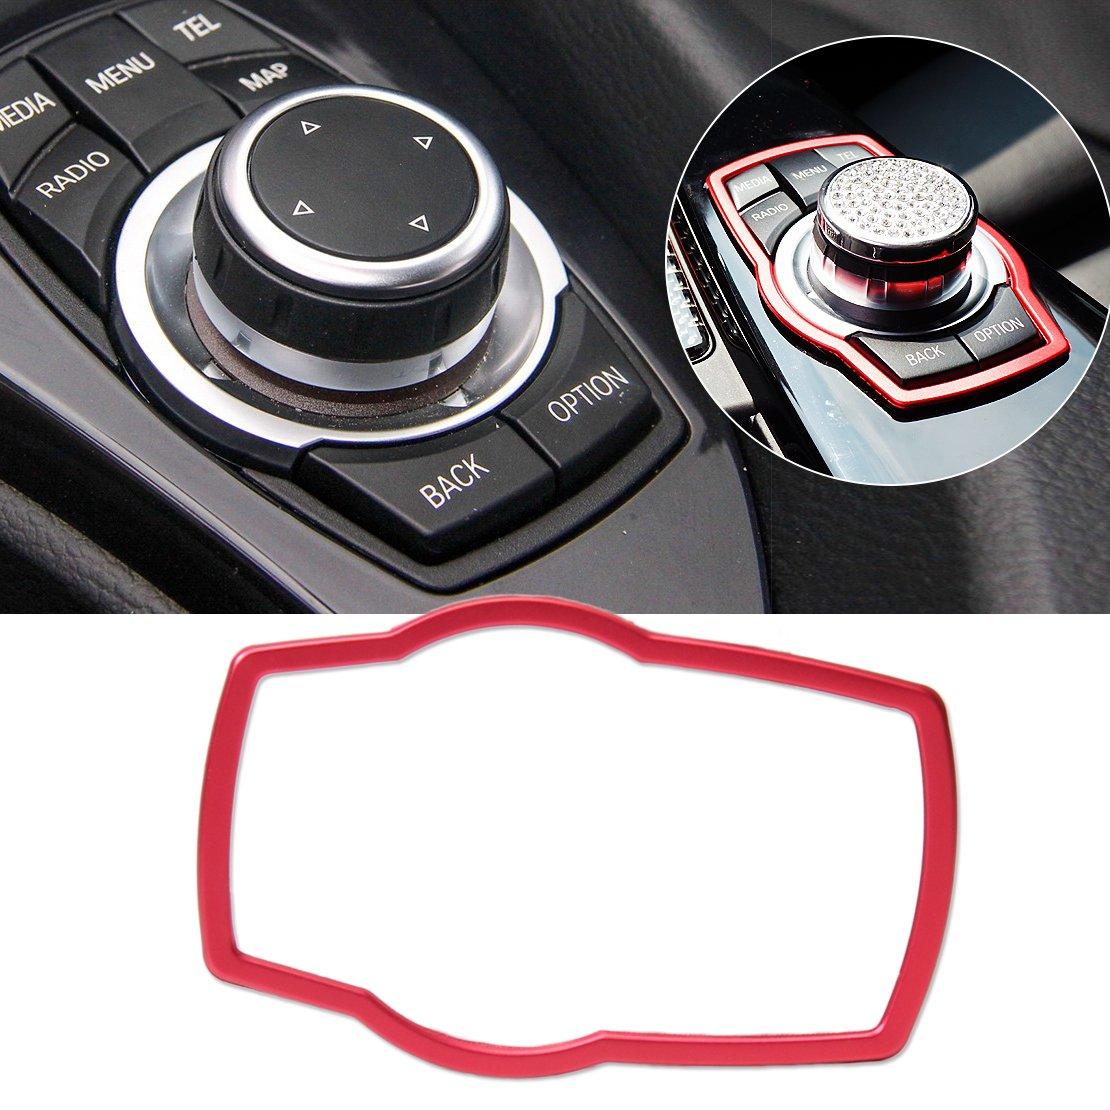 beler Silver Car Interior Multimedia Button Cover Decor Molding Trim Decoration For BMW 1 3 4 5 7 Series X1 X3 X4 X5 X6 hermeshine